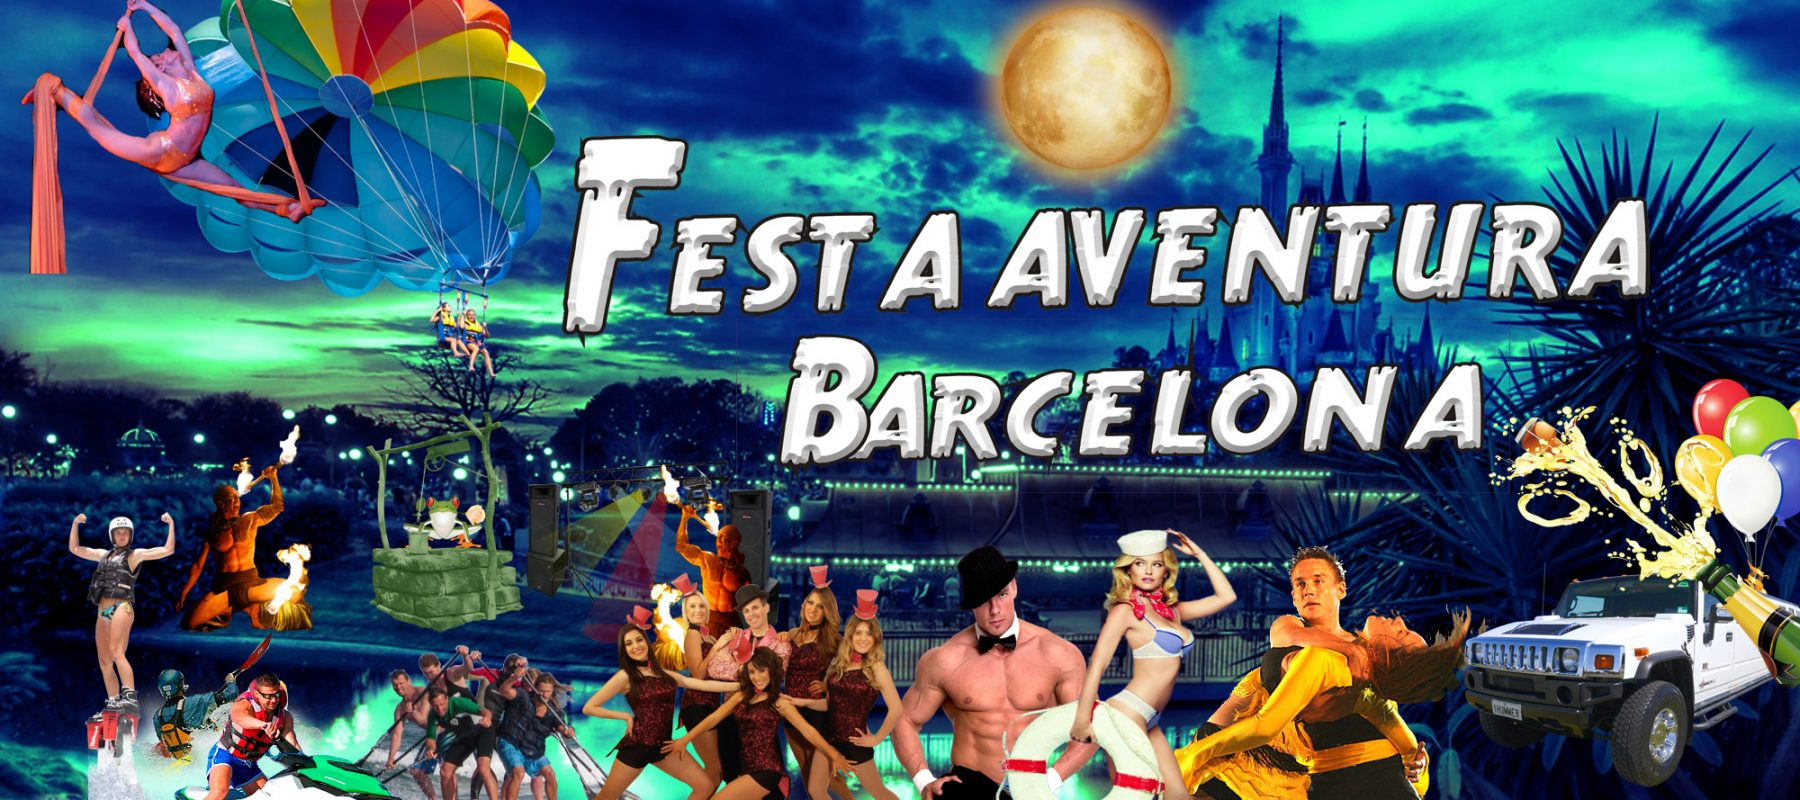 Festa Aventura Barcelona